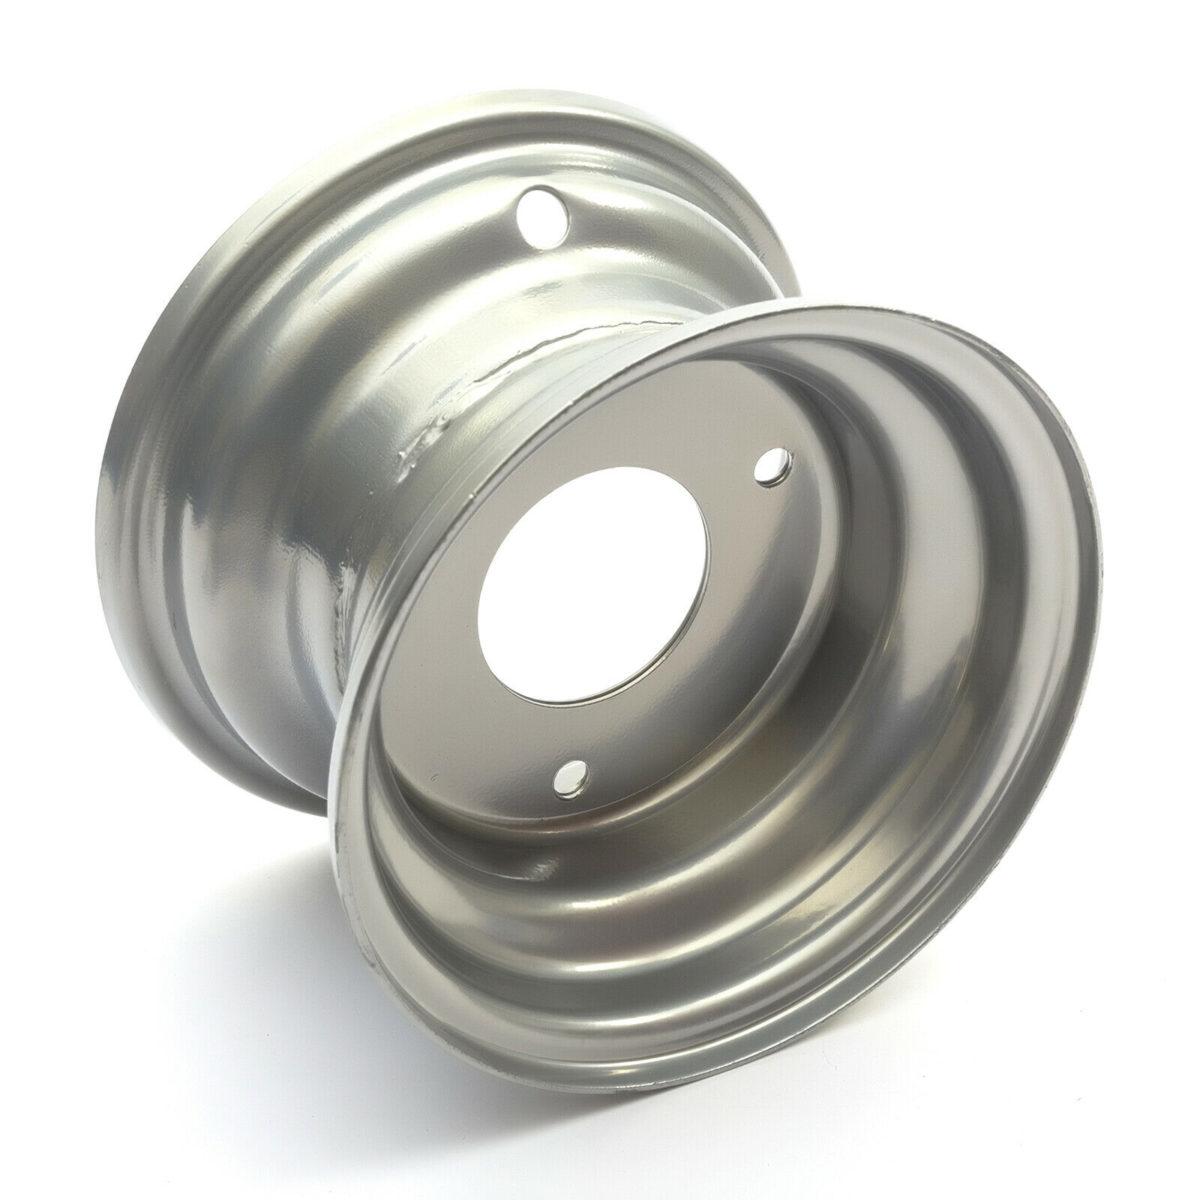 "Wheel Rim 6"" 6 Inch 3 Stud 145×70-6 50cc 70cc 90cc Kids Quad Bike Atv 54mm Hole – Silver"